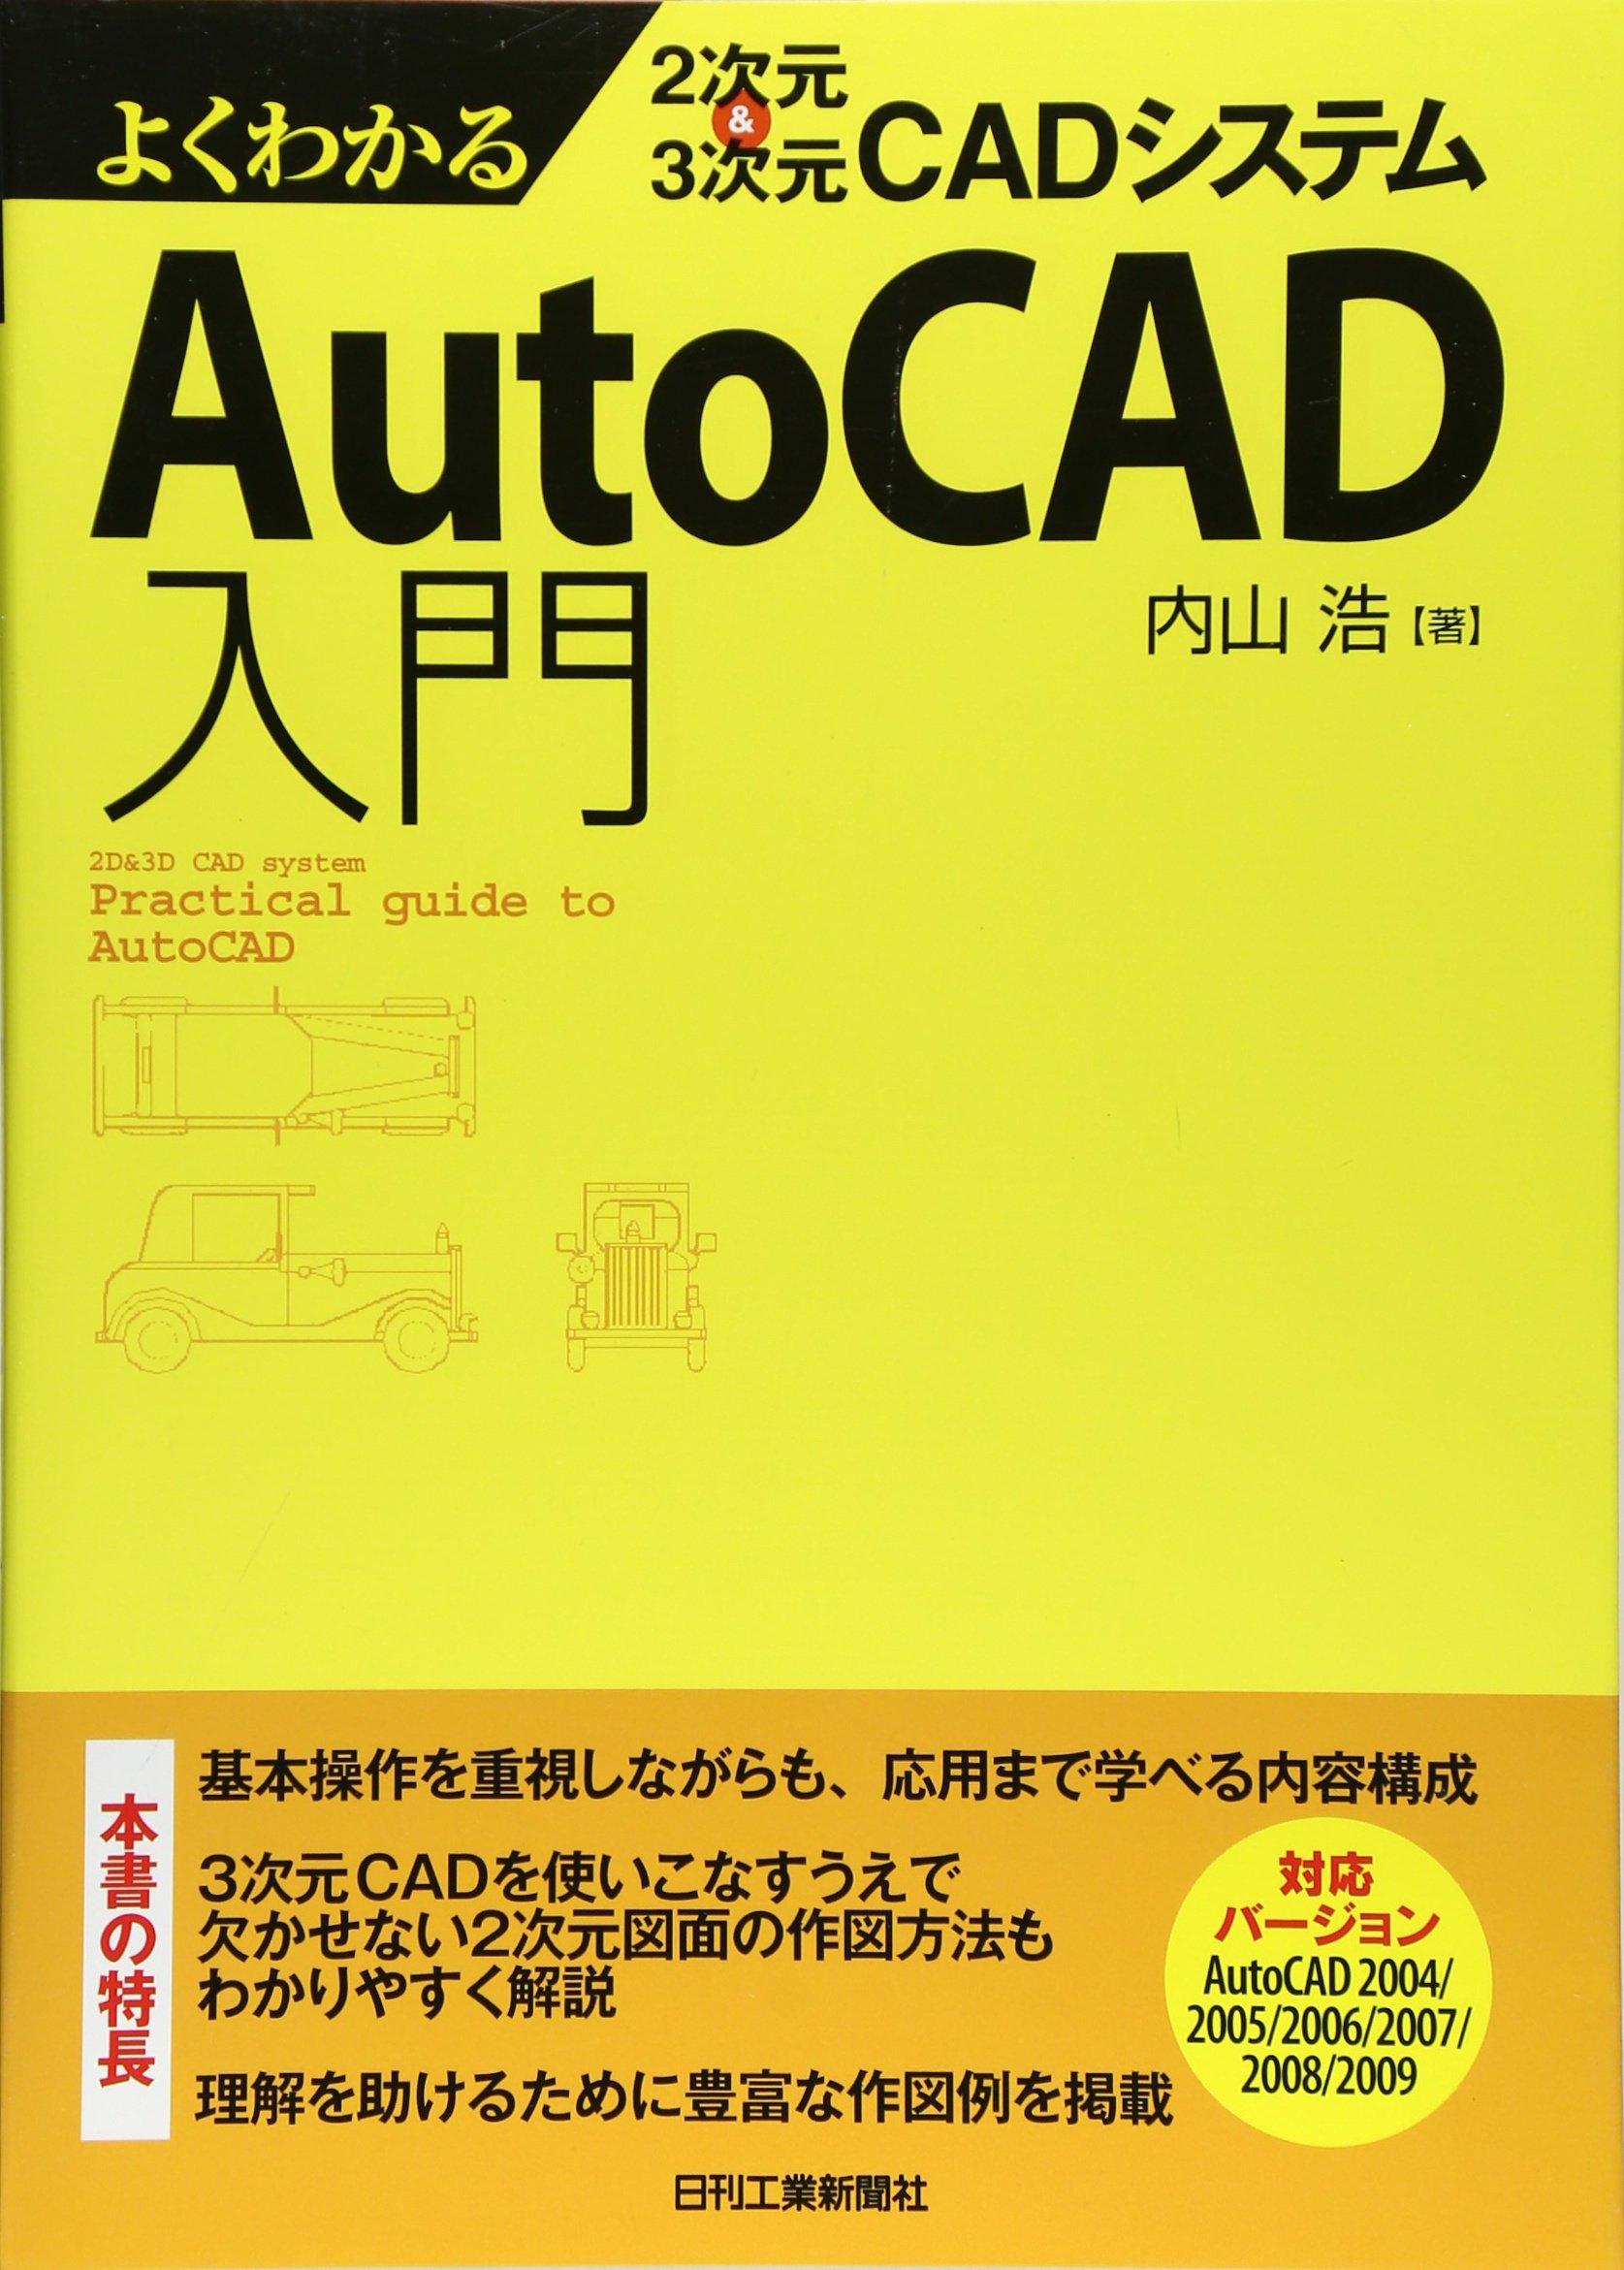 Download Yoku wakaru 2jigen & 3jigen CAD shisutemu AutoCAD nyūmon ebook